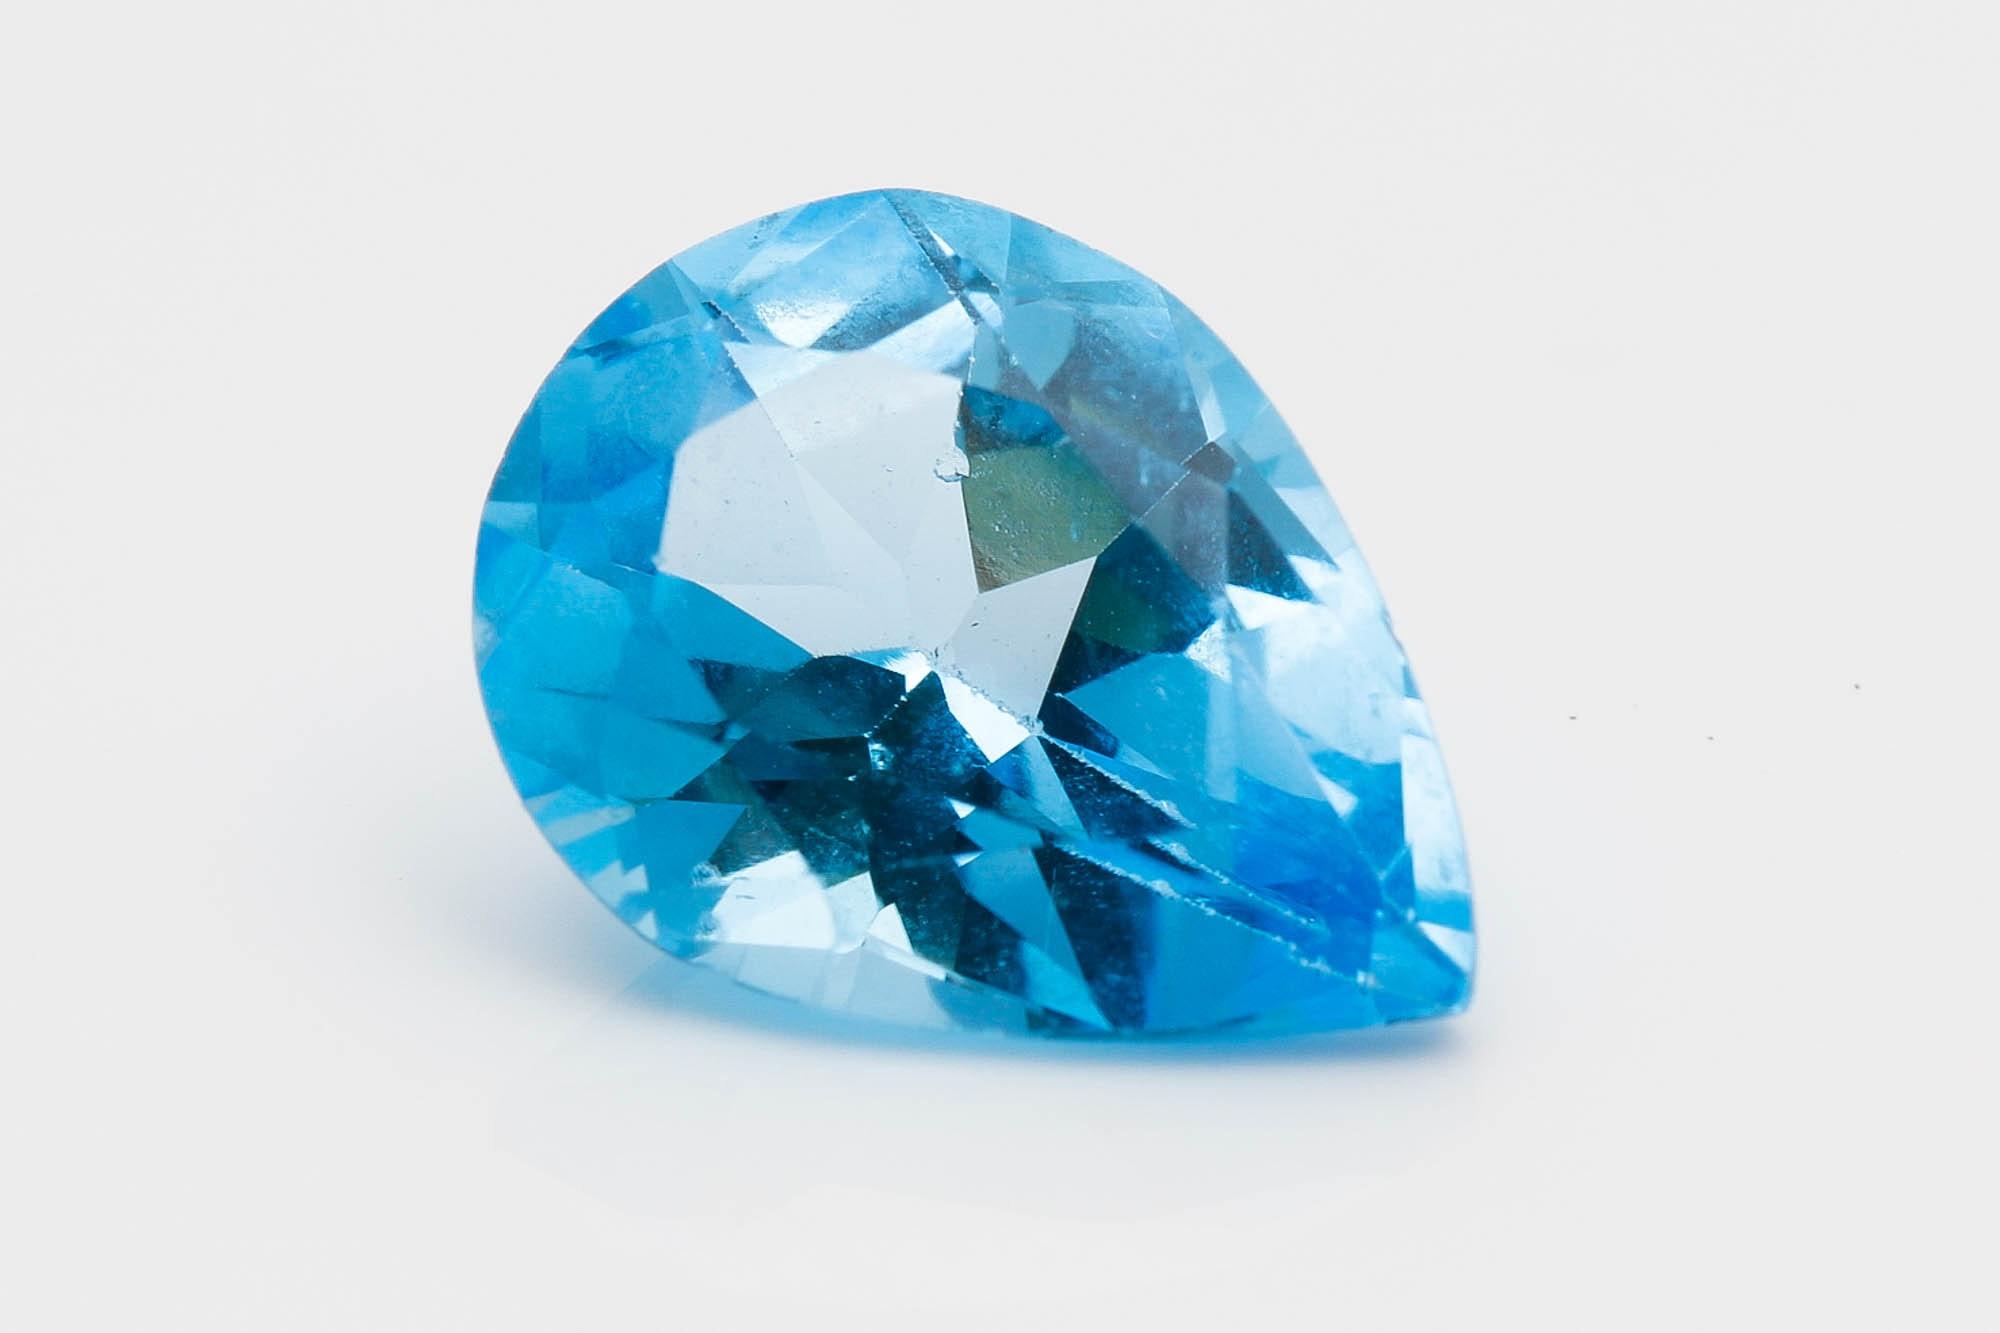 3.55 CT Blue Topaz